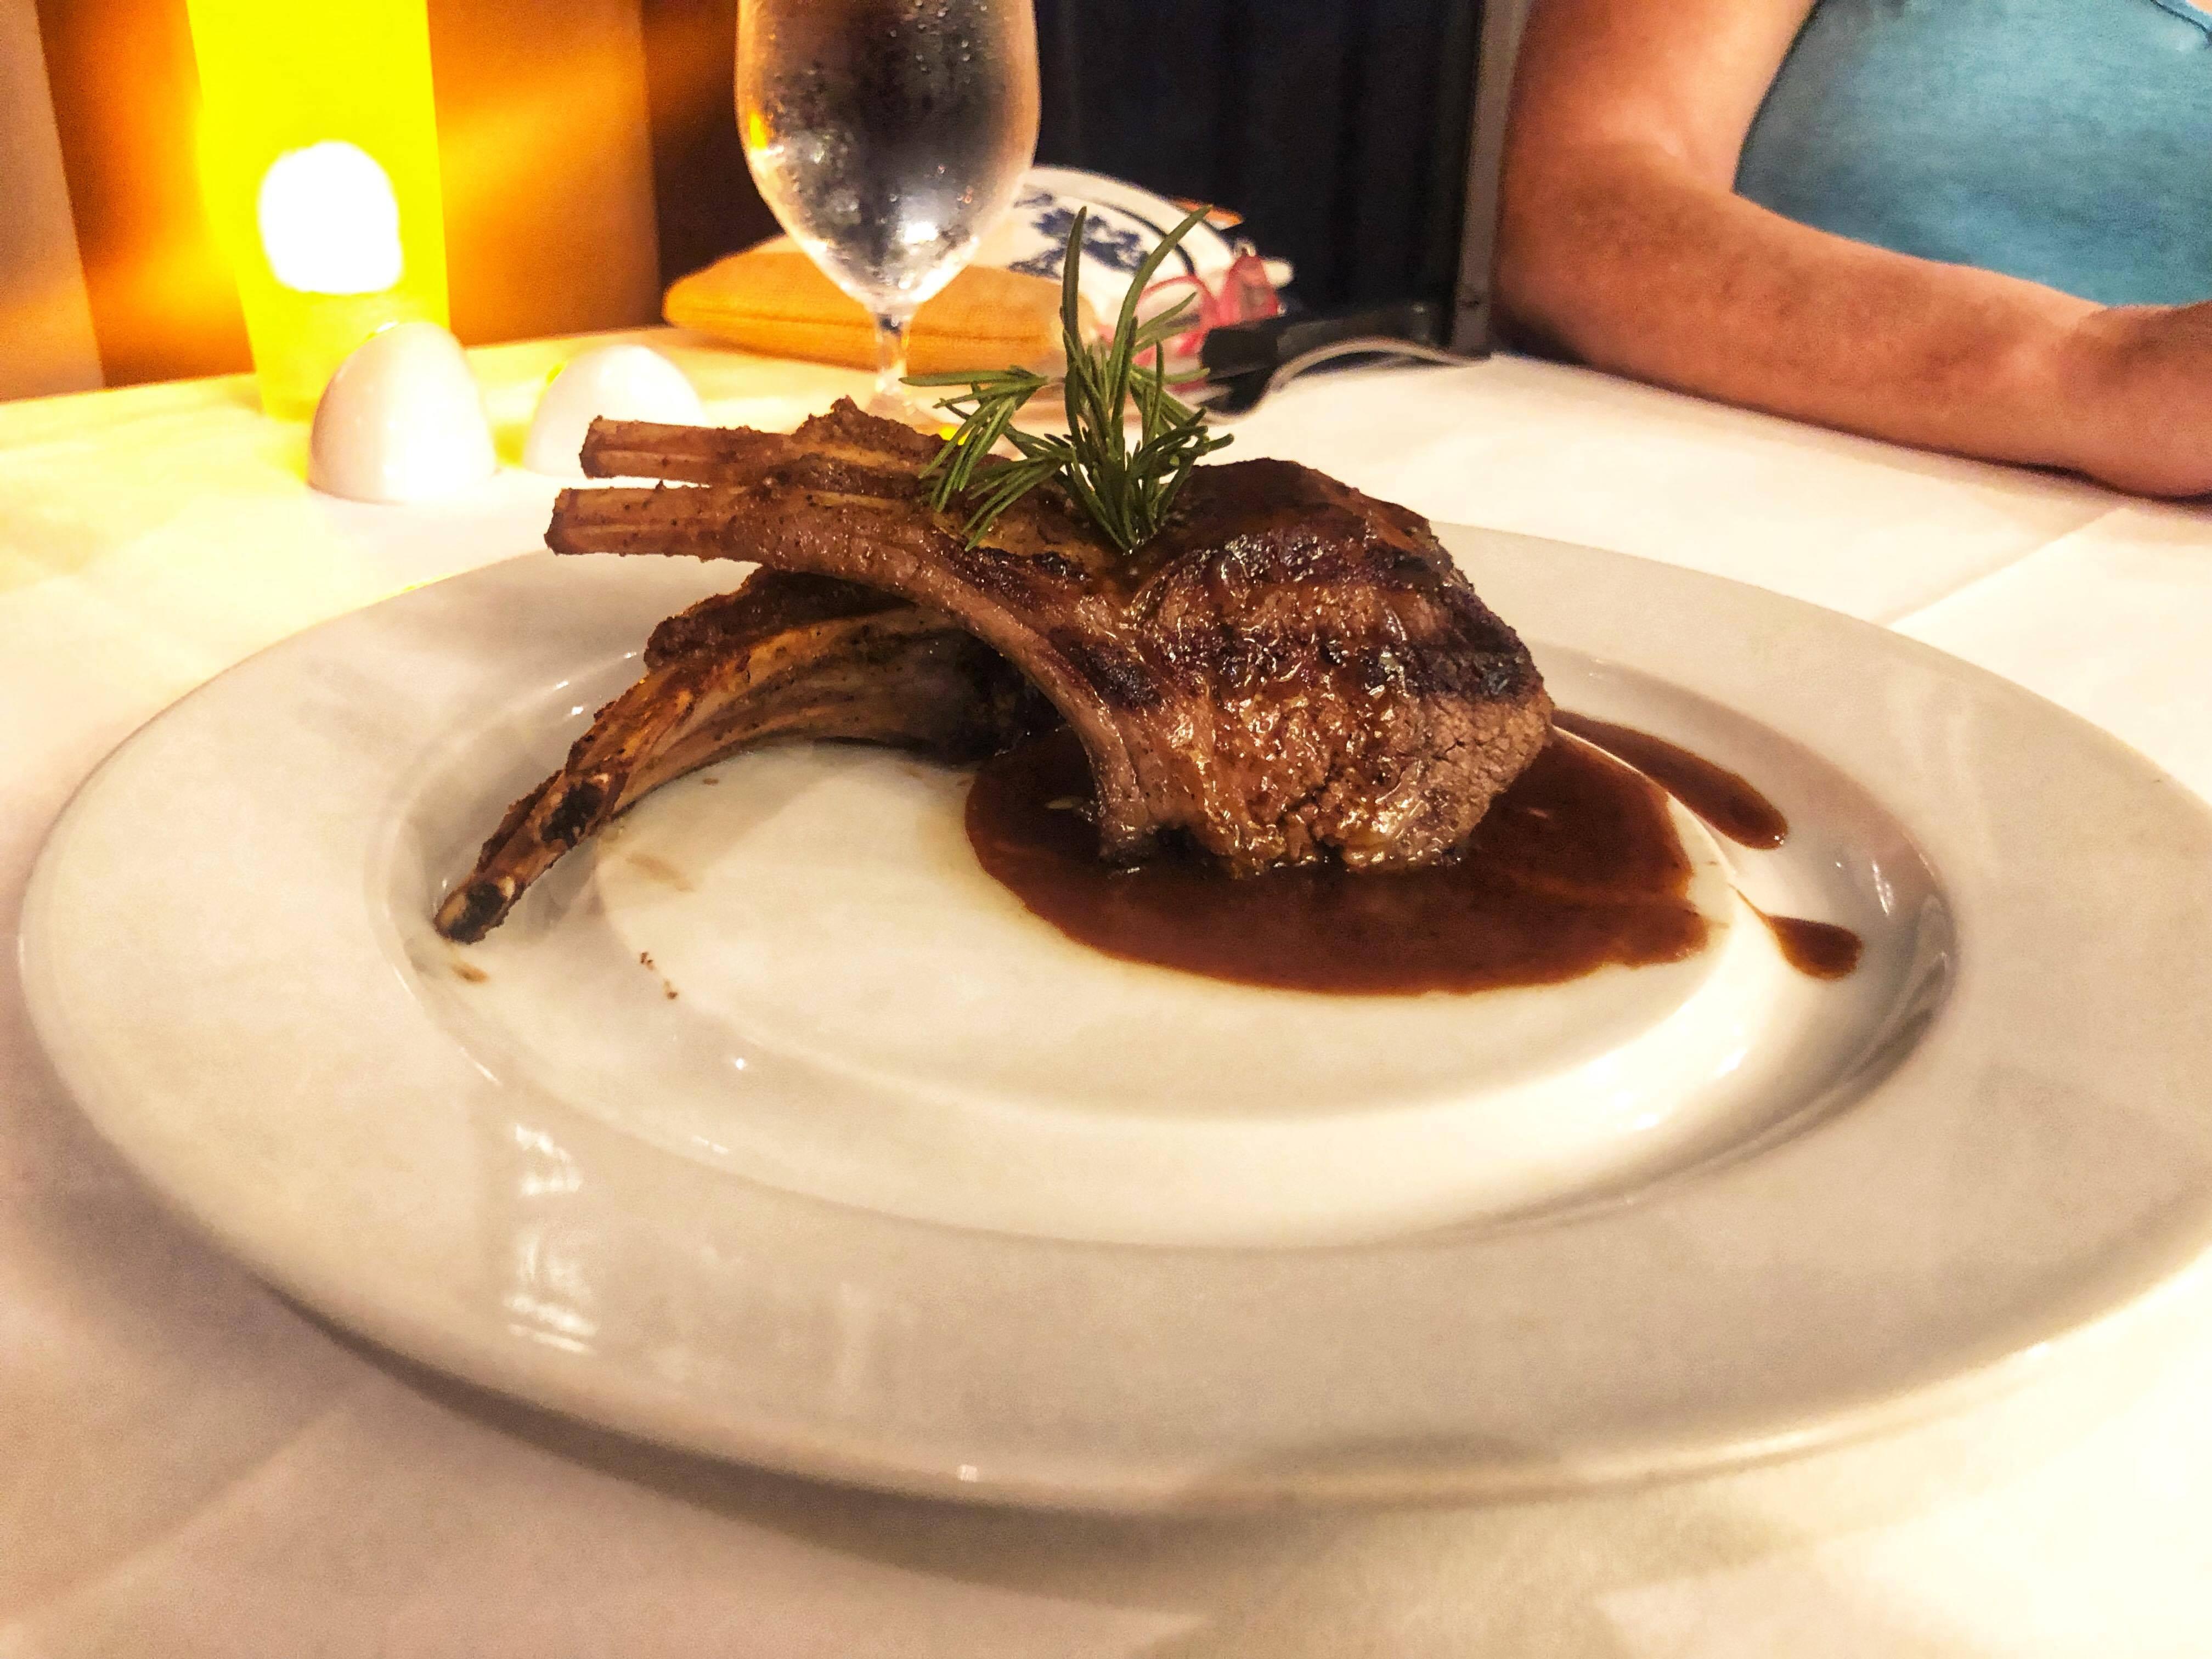 Dinner at Chops Grille-Vision OTS